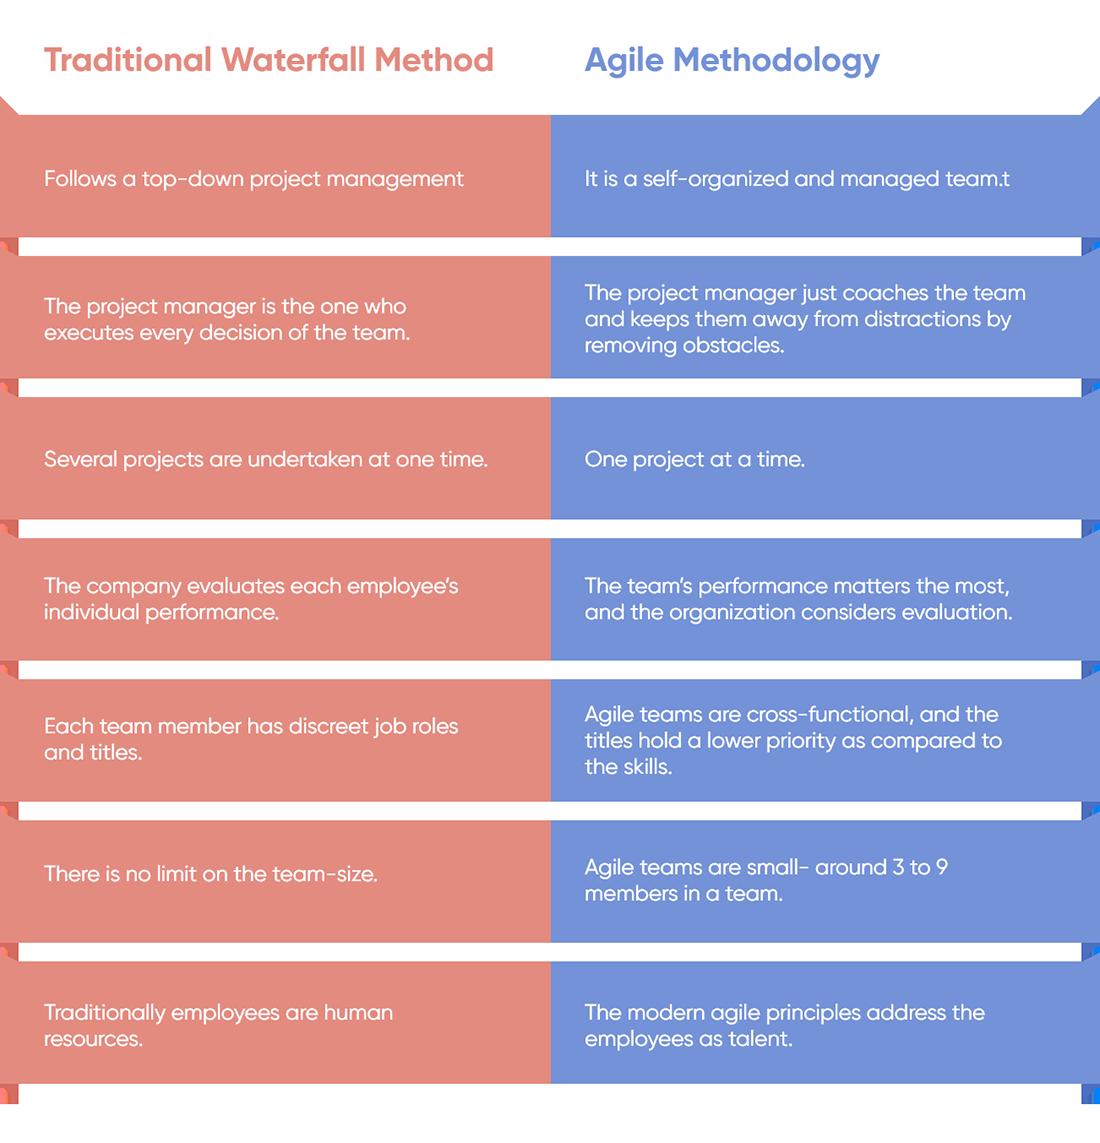 Agile Vs Traditional Teams